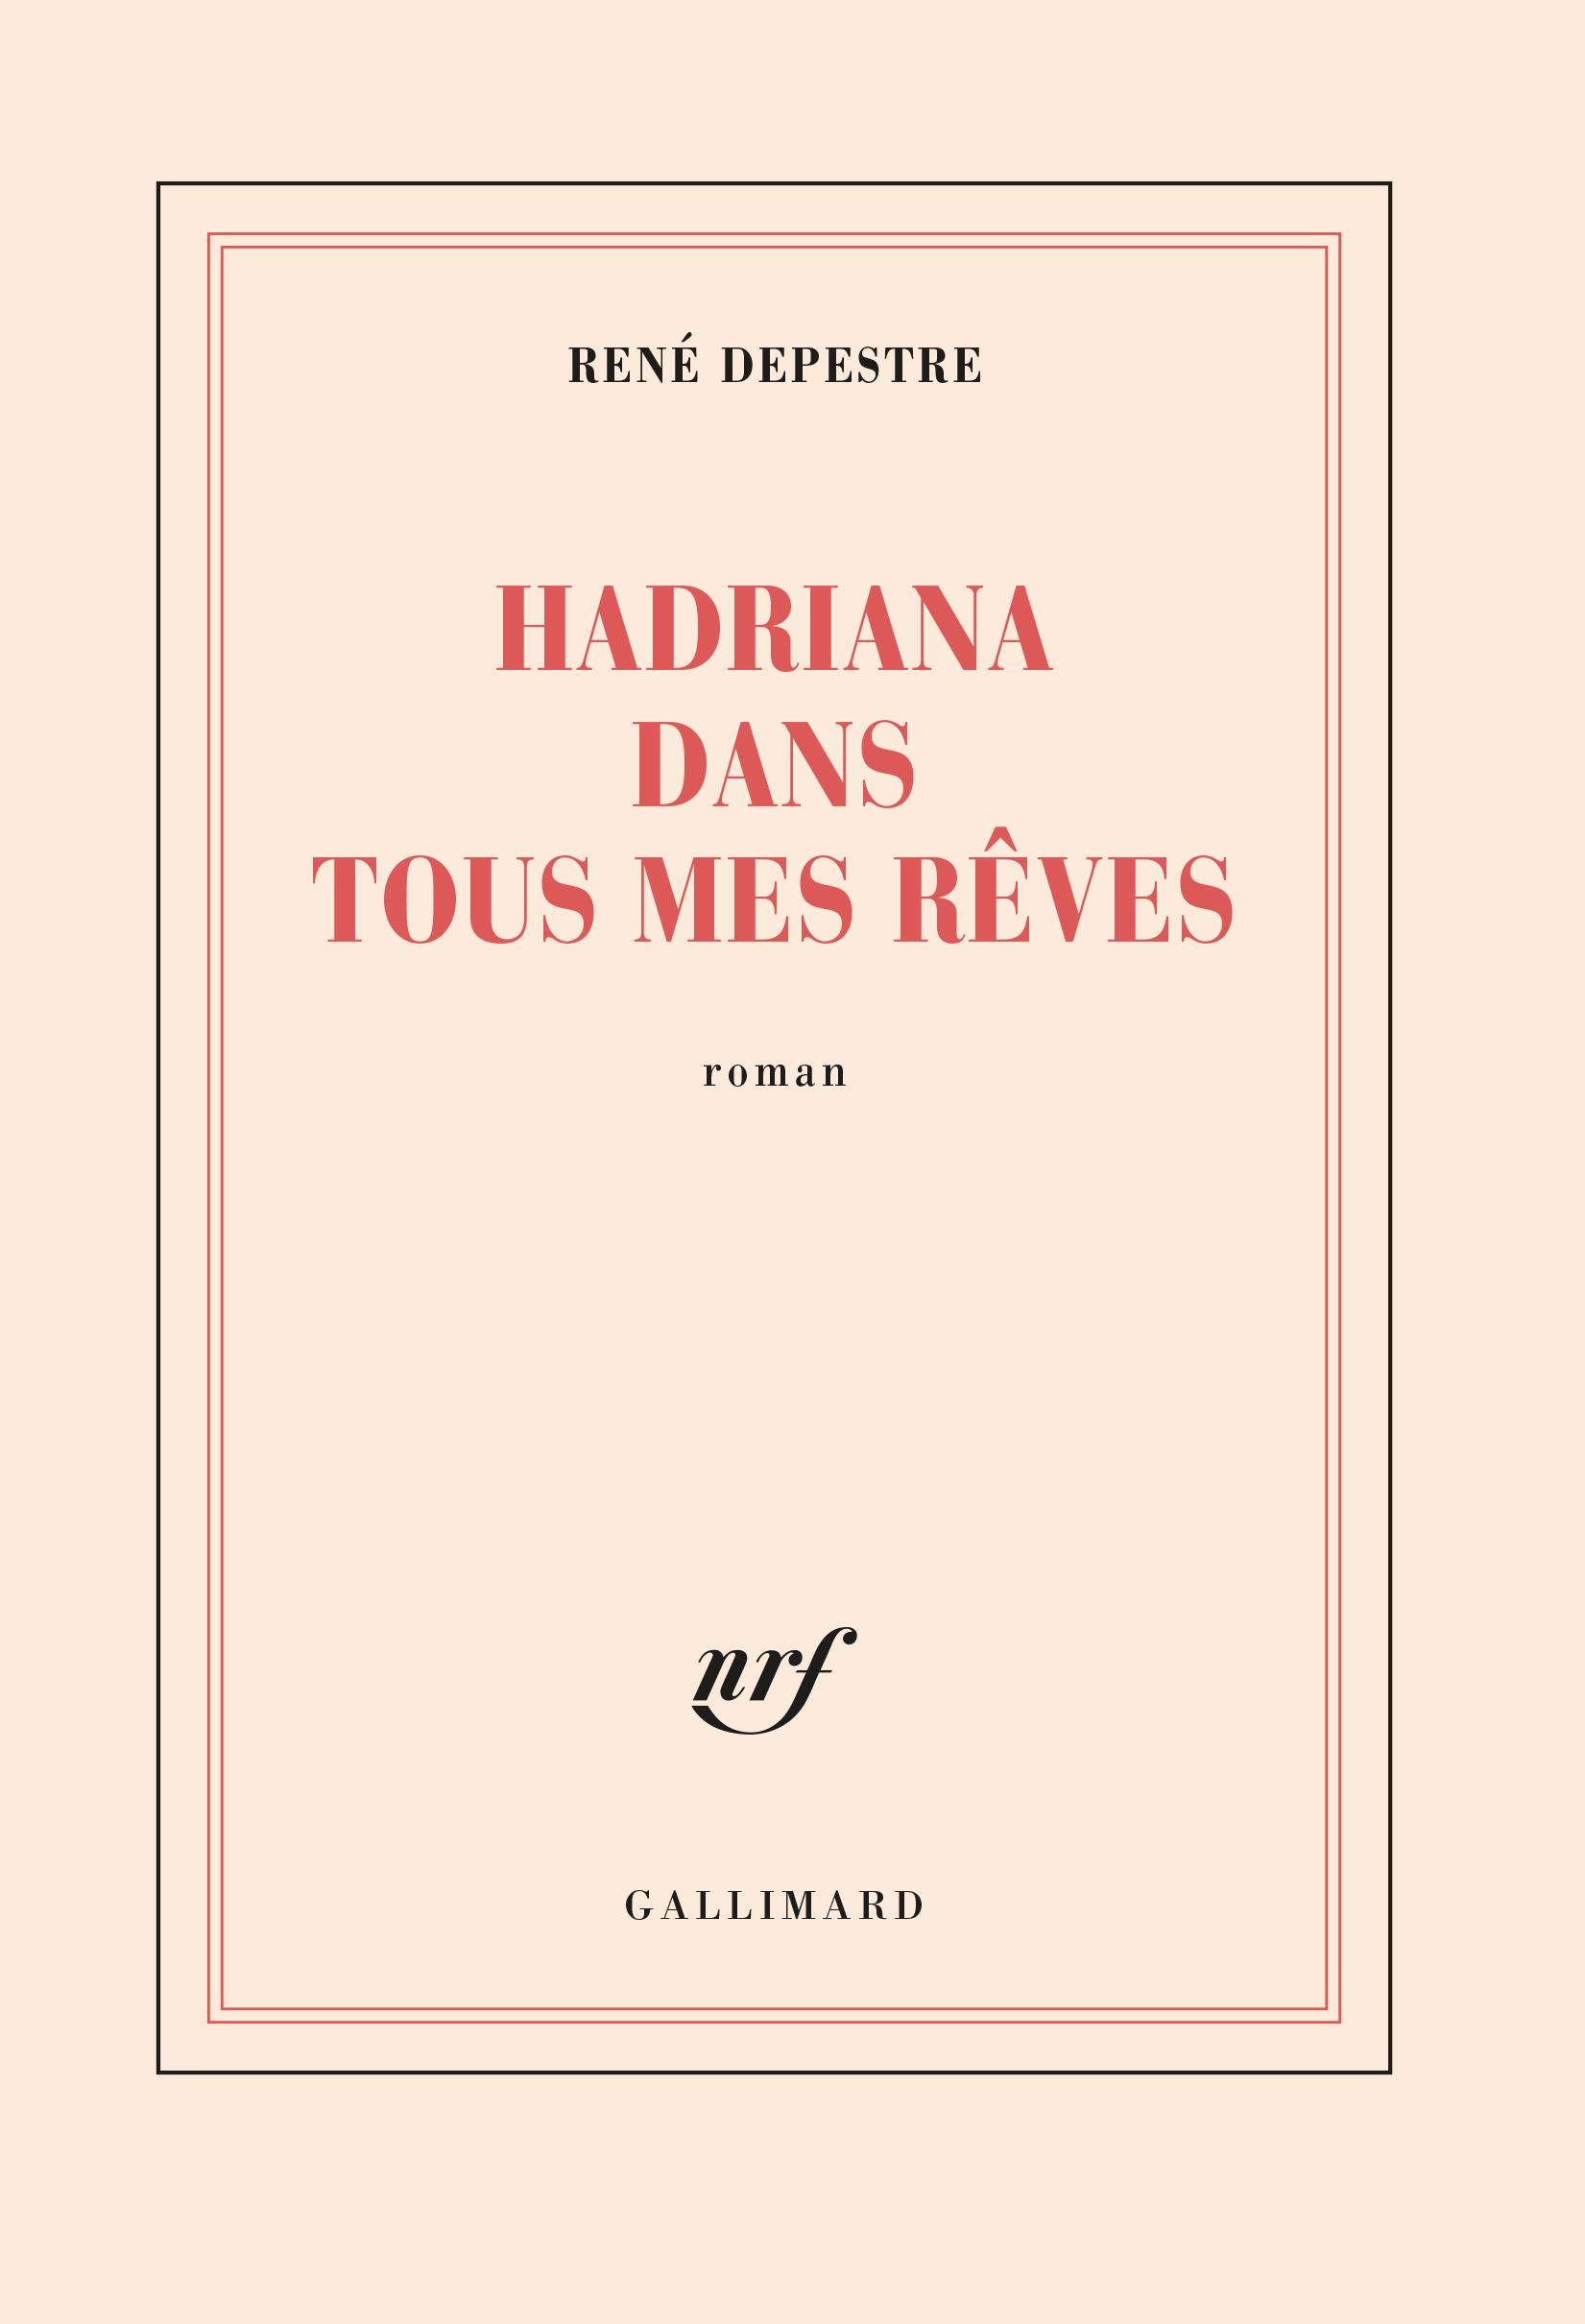 HADRIANA DANS TOUS MES REVES ROMAN